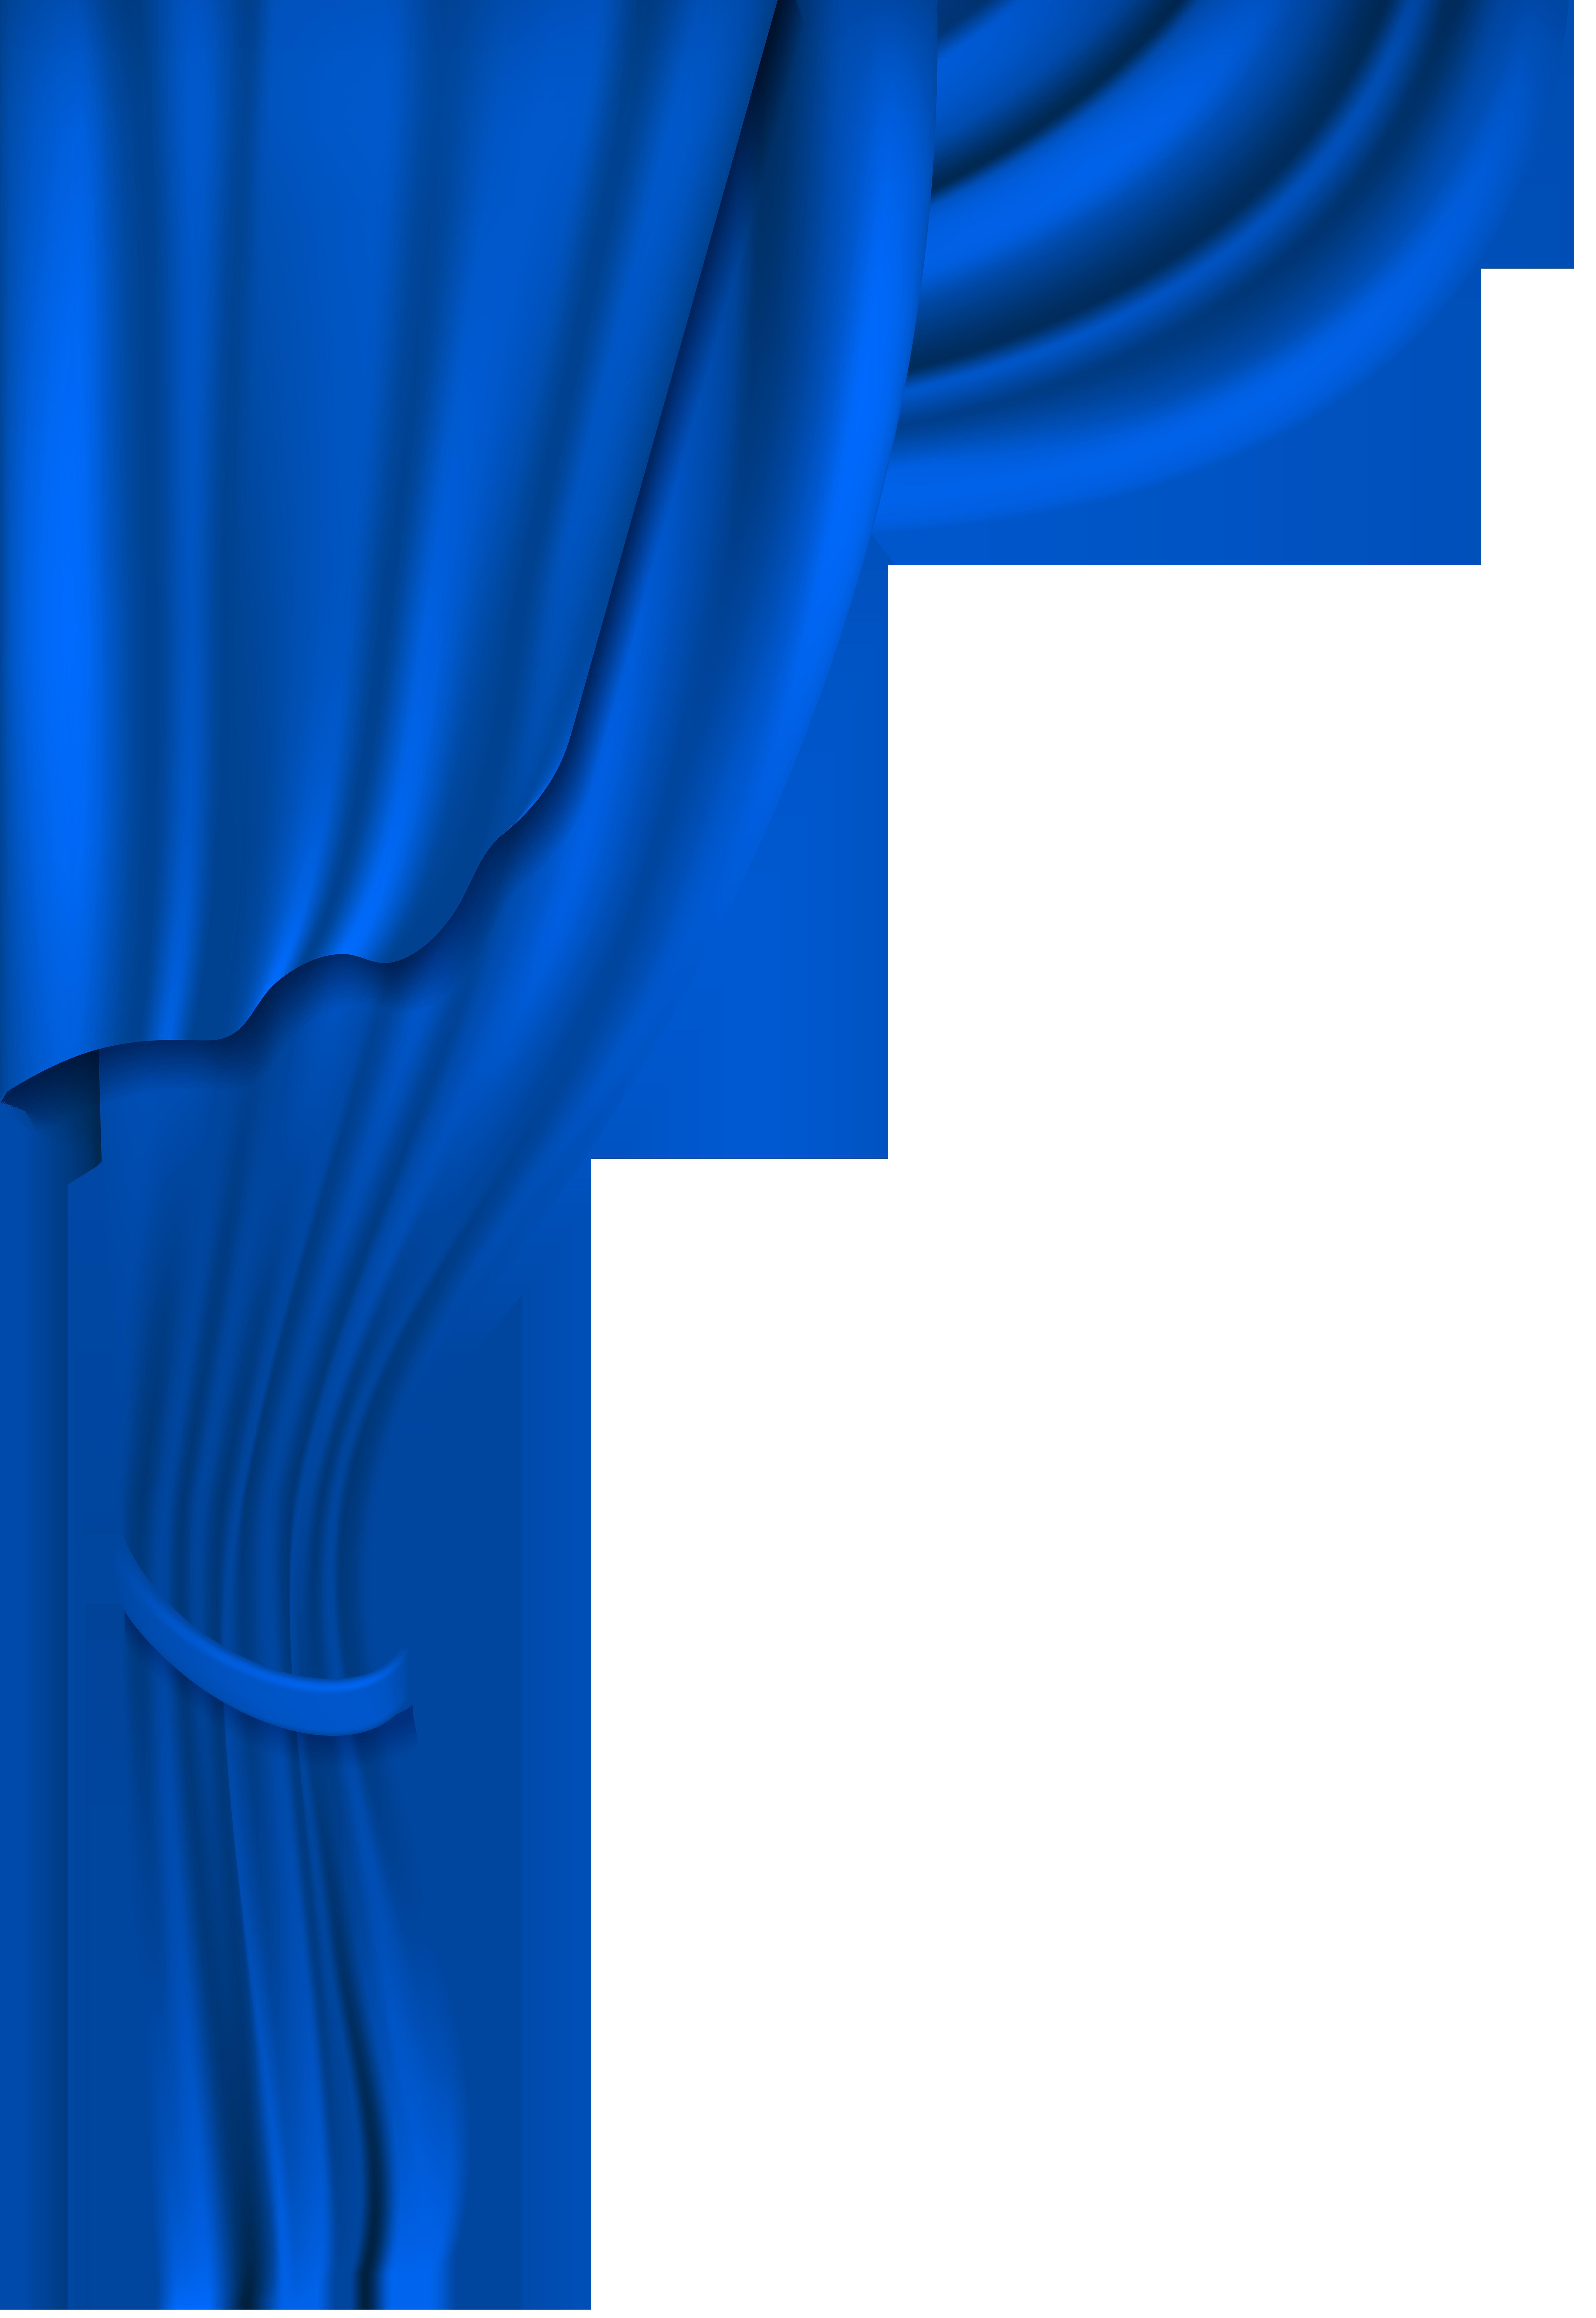 5509x8000 Blue Curtain Transparent Clip Art Imageu200b Gallery Yopriceville